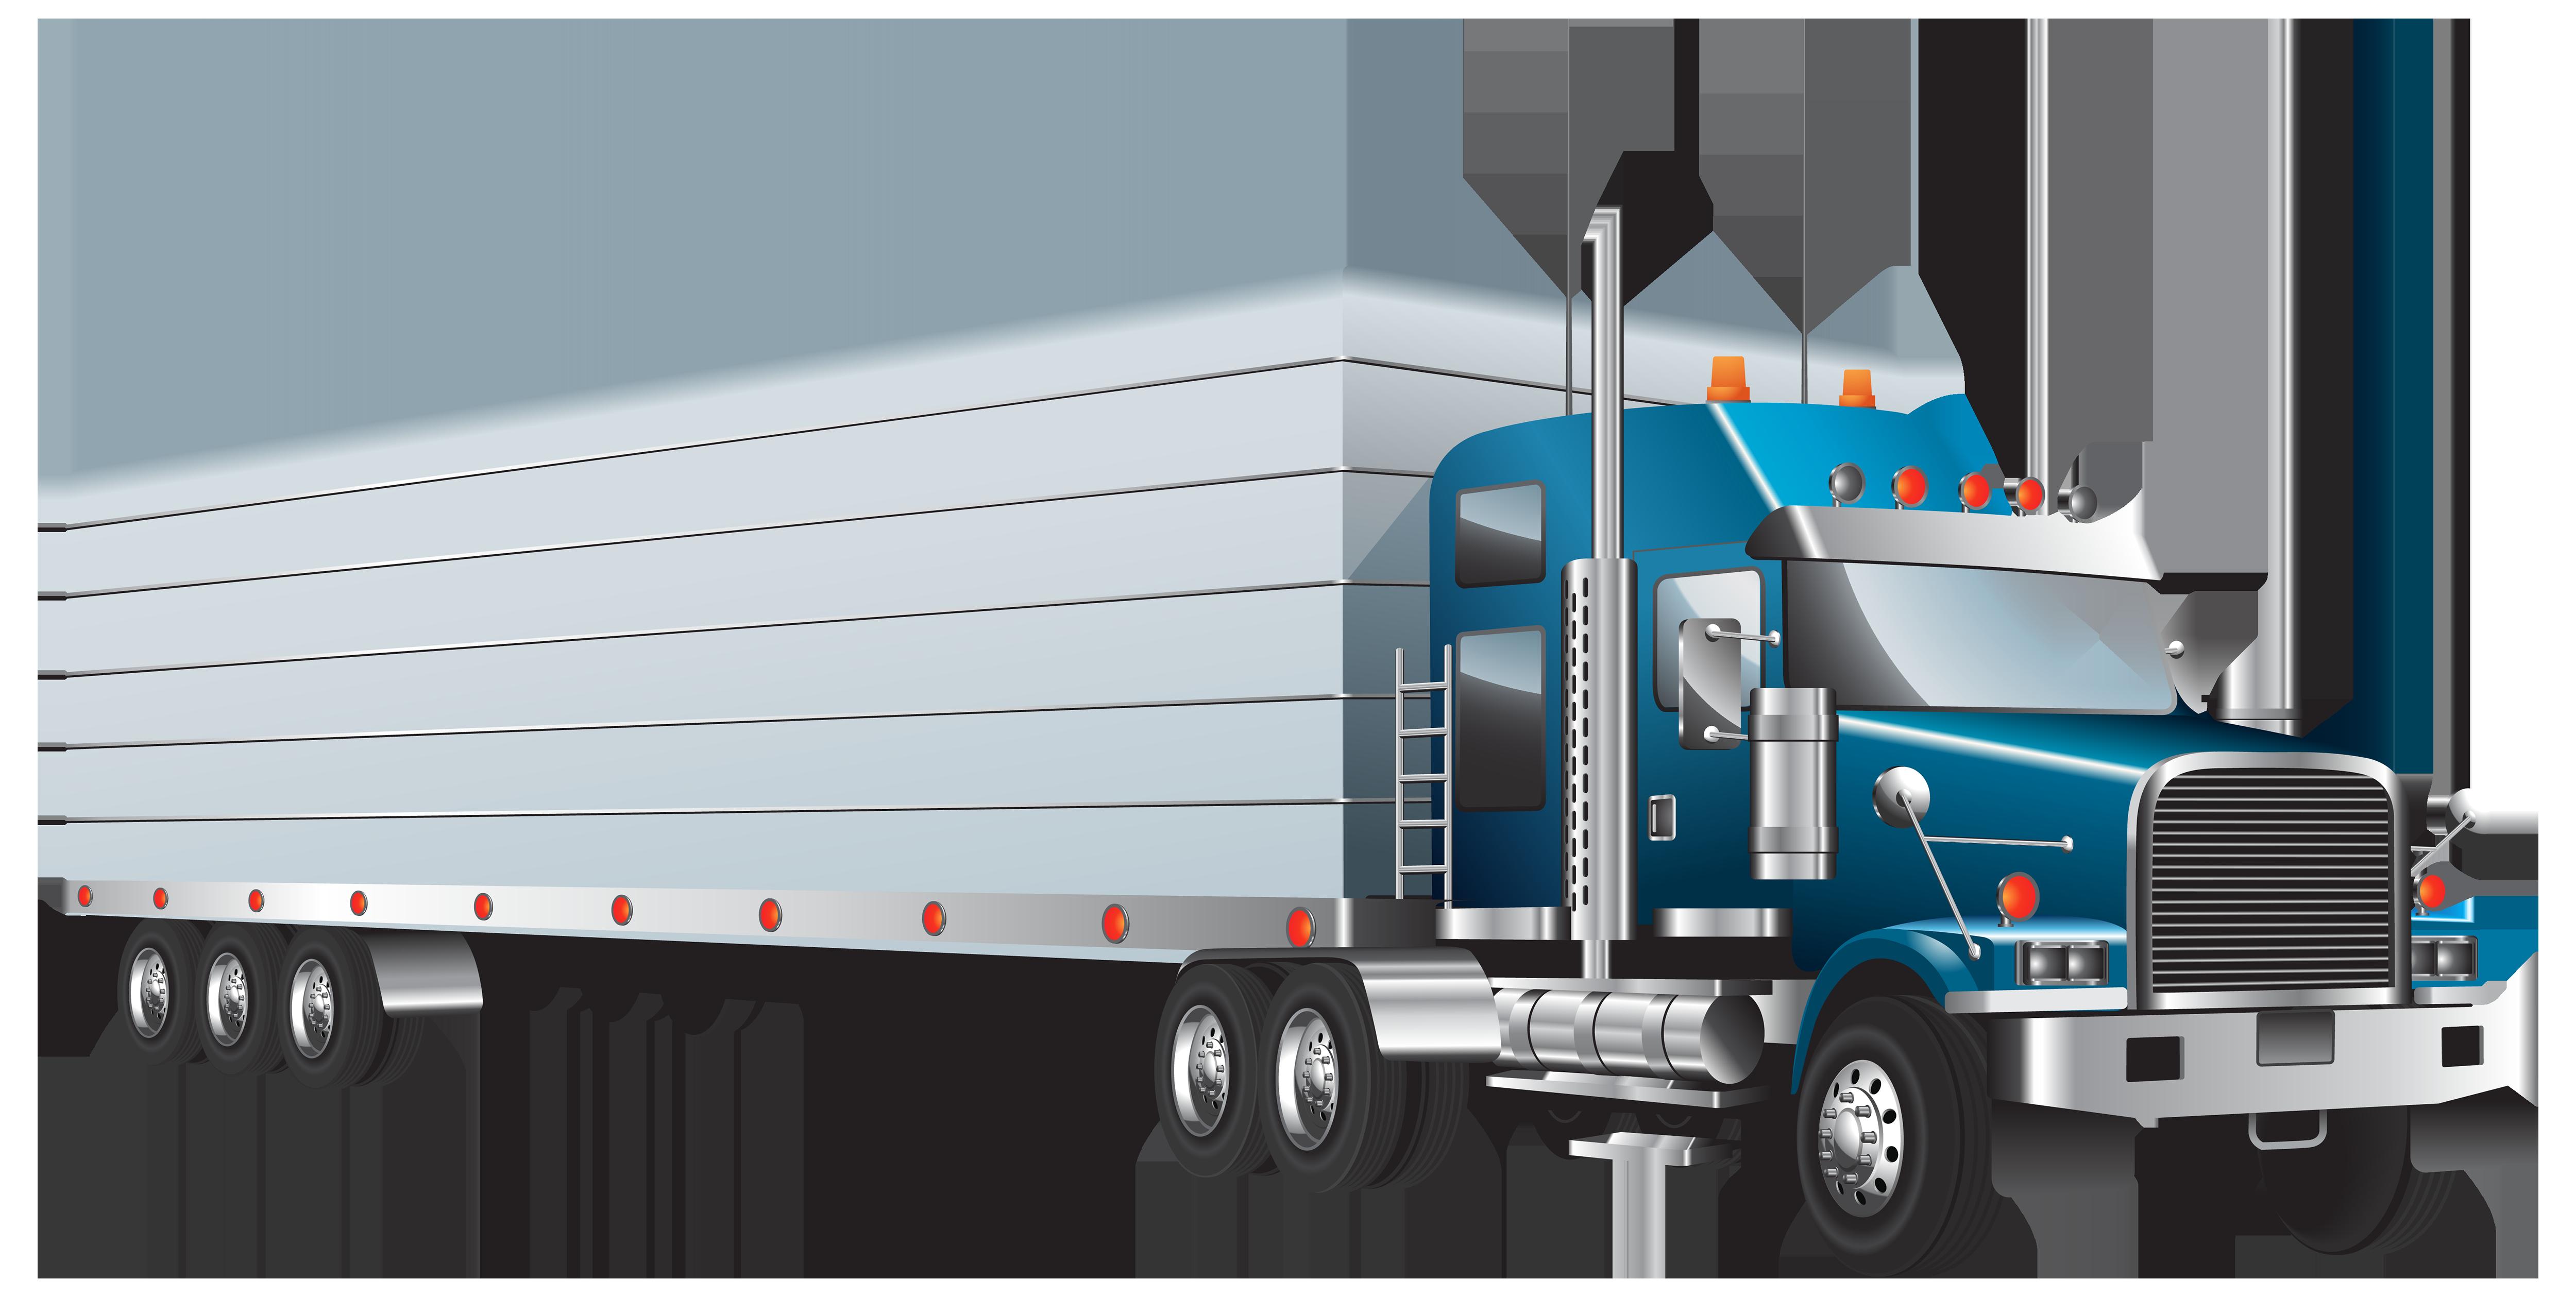 Truck HD PNG - 95714